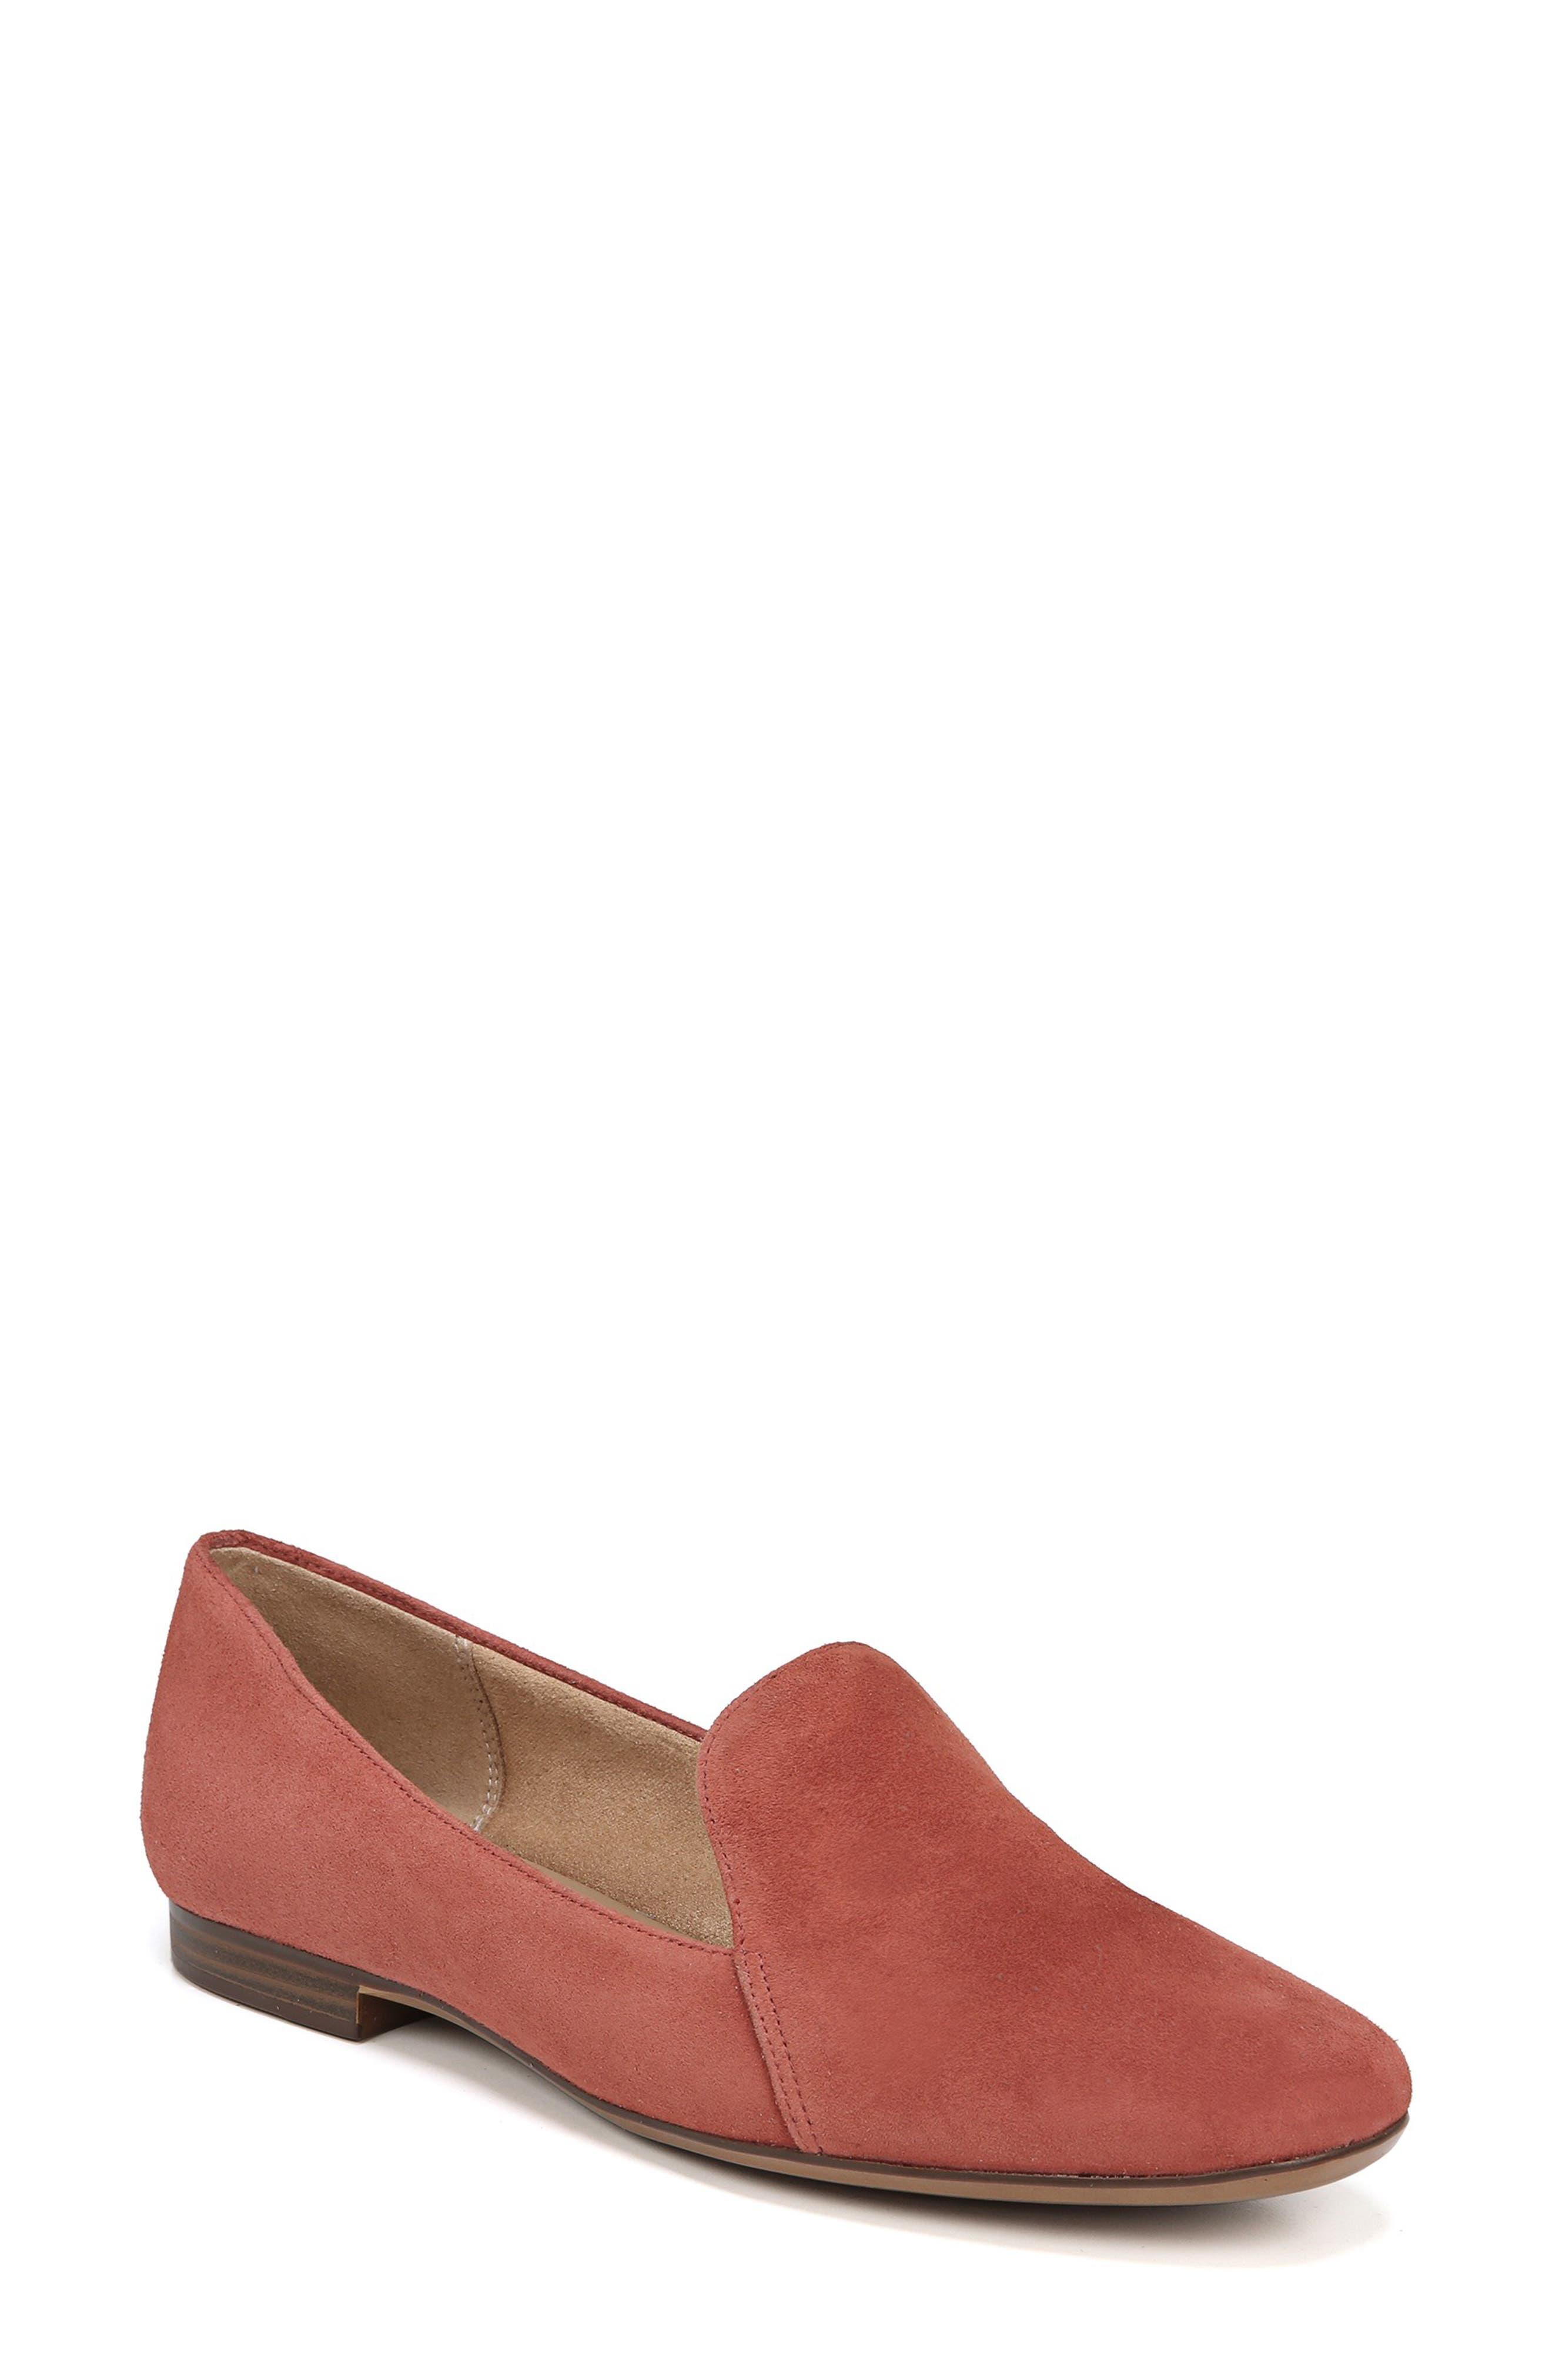 Emiline Flat Loafer,                         Main,                         color, DESERT CLAY SUEDE